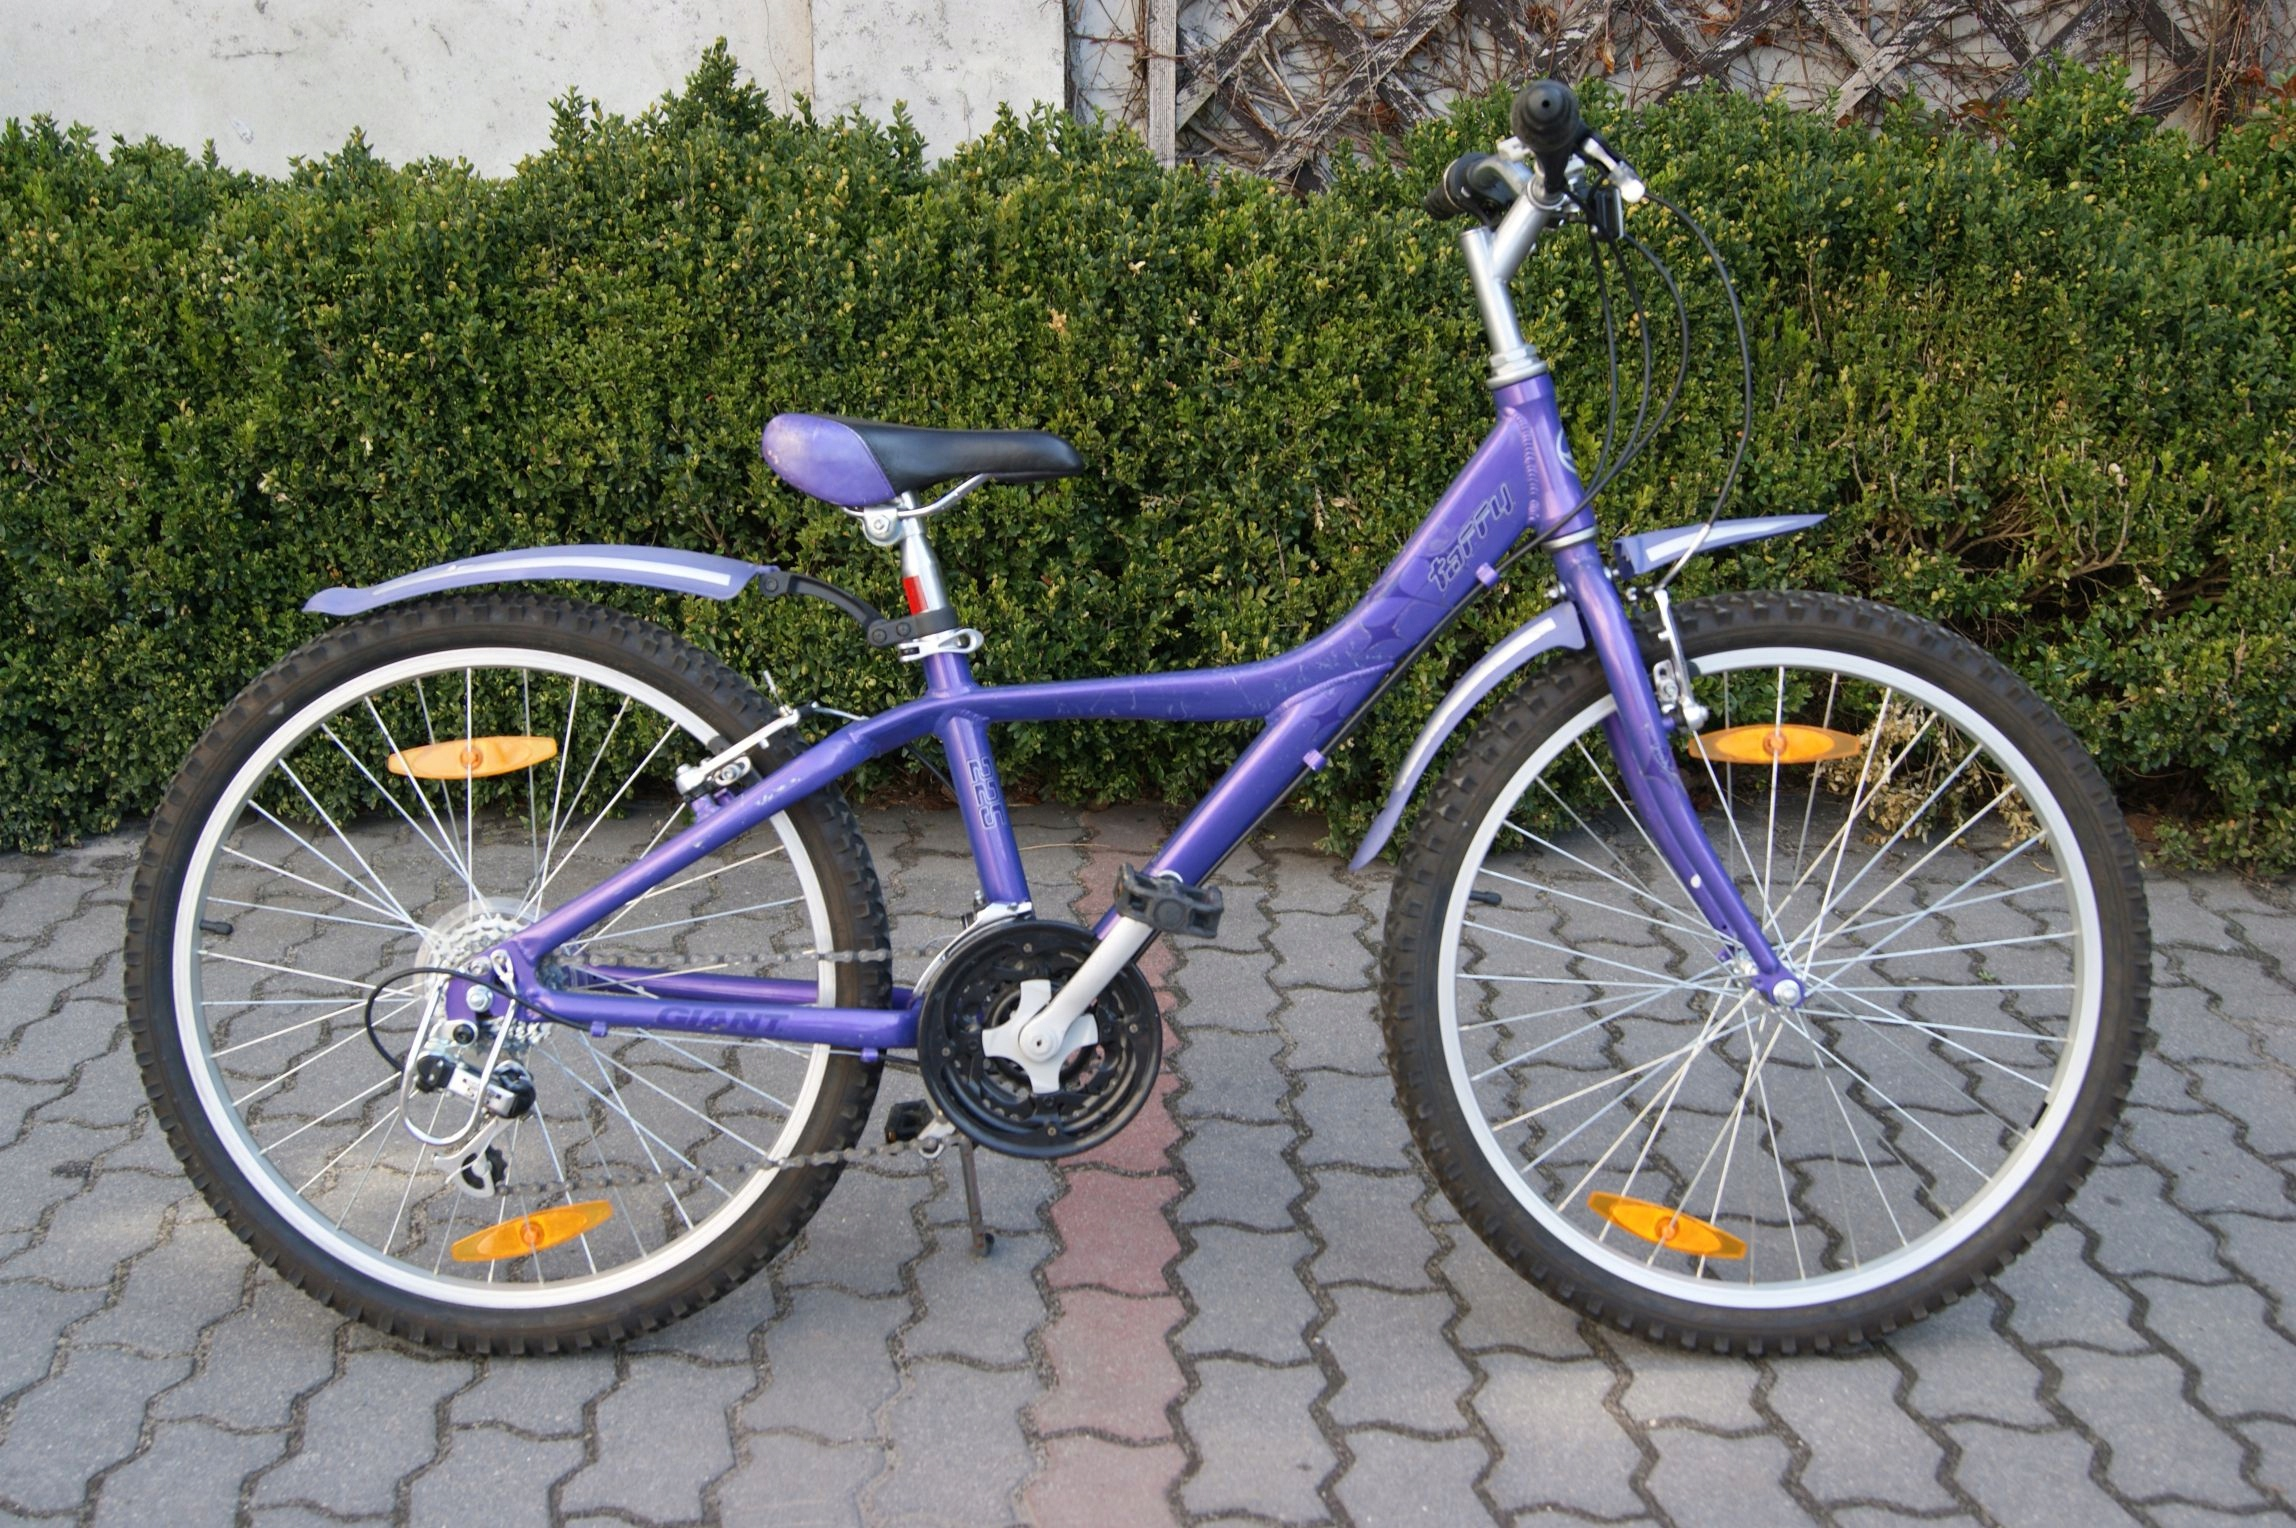 R267 Aluminiowy juniorski rower GIANT 24'' koła